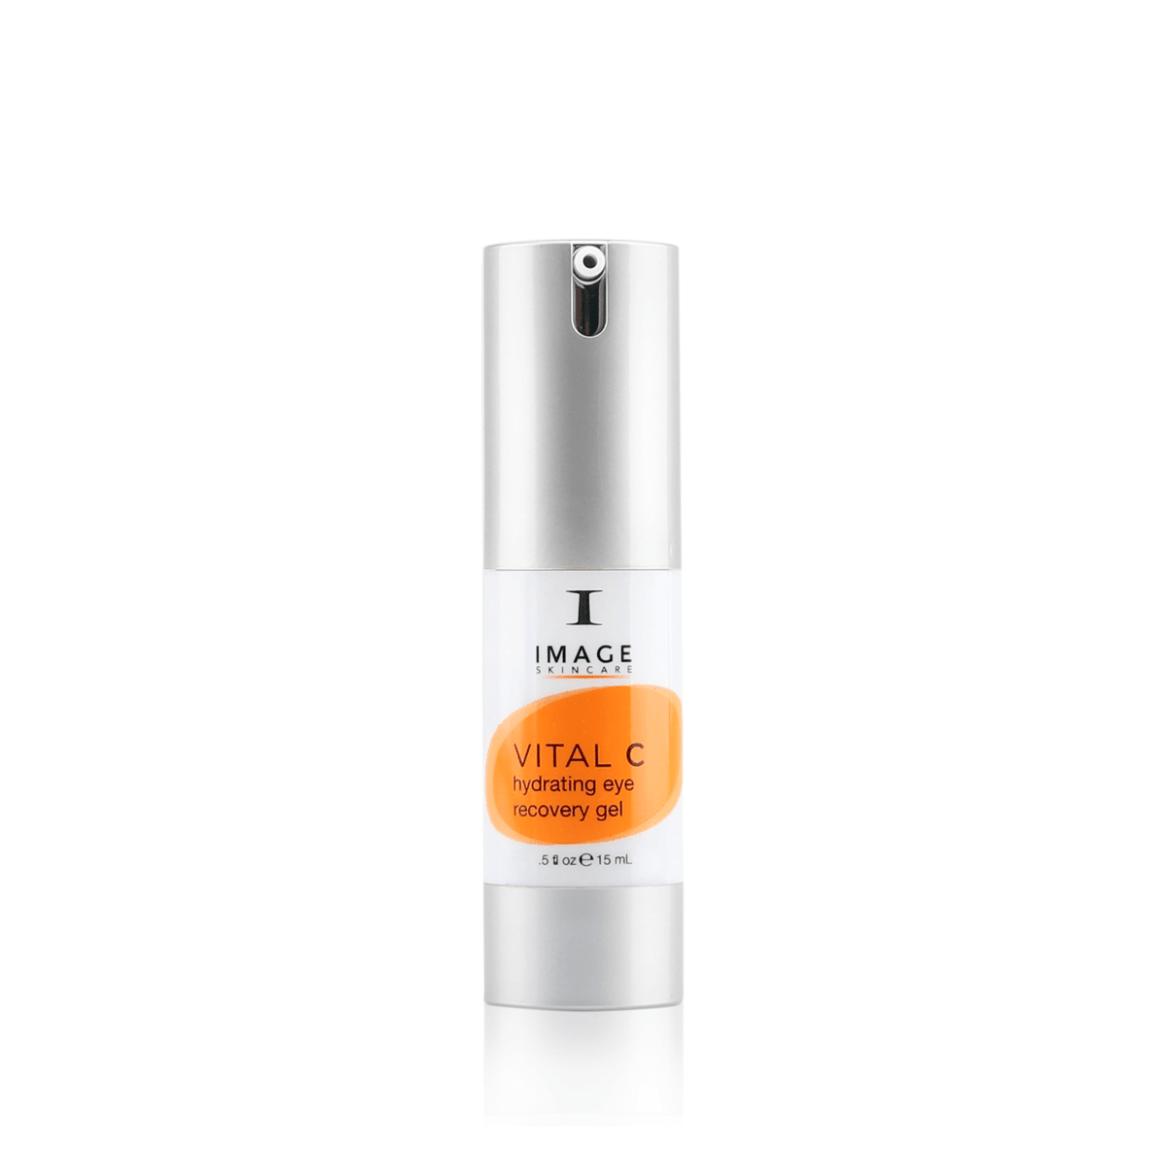 IMAGE VITAL C skin hydrating eye recovery gel